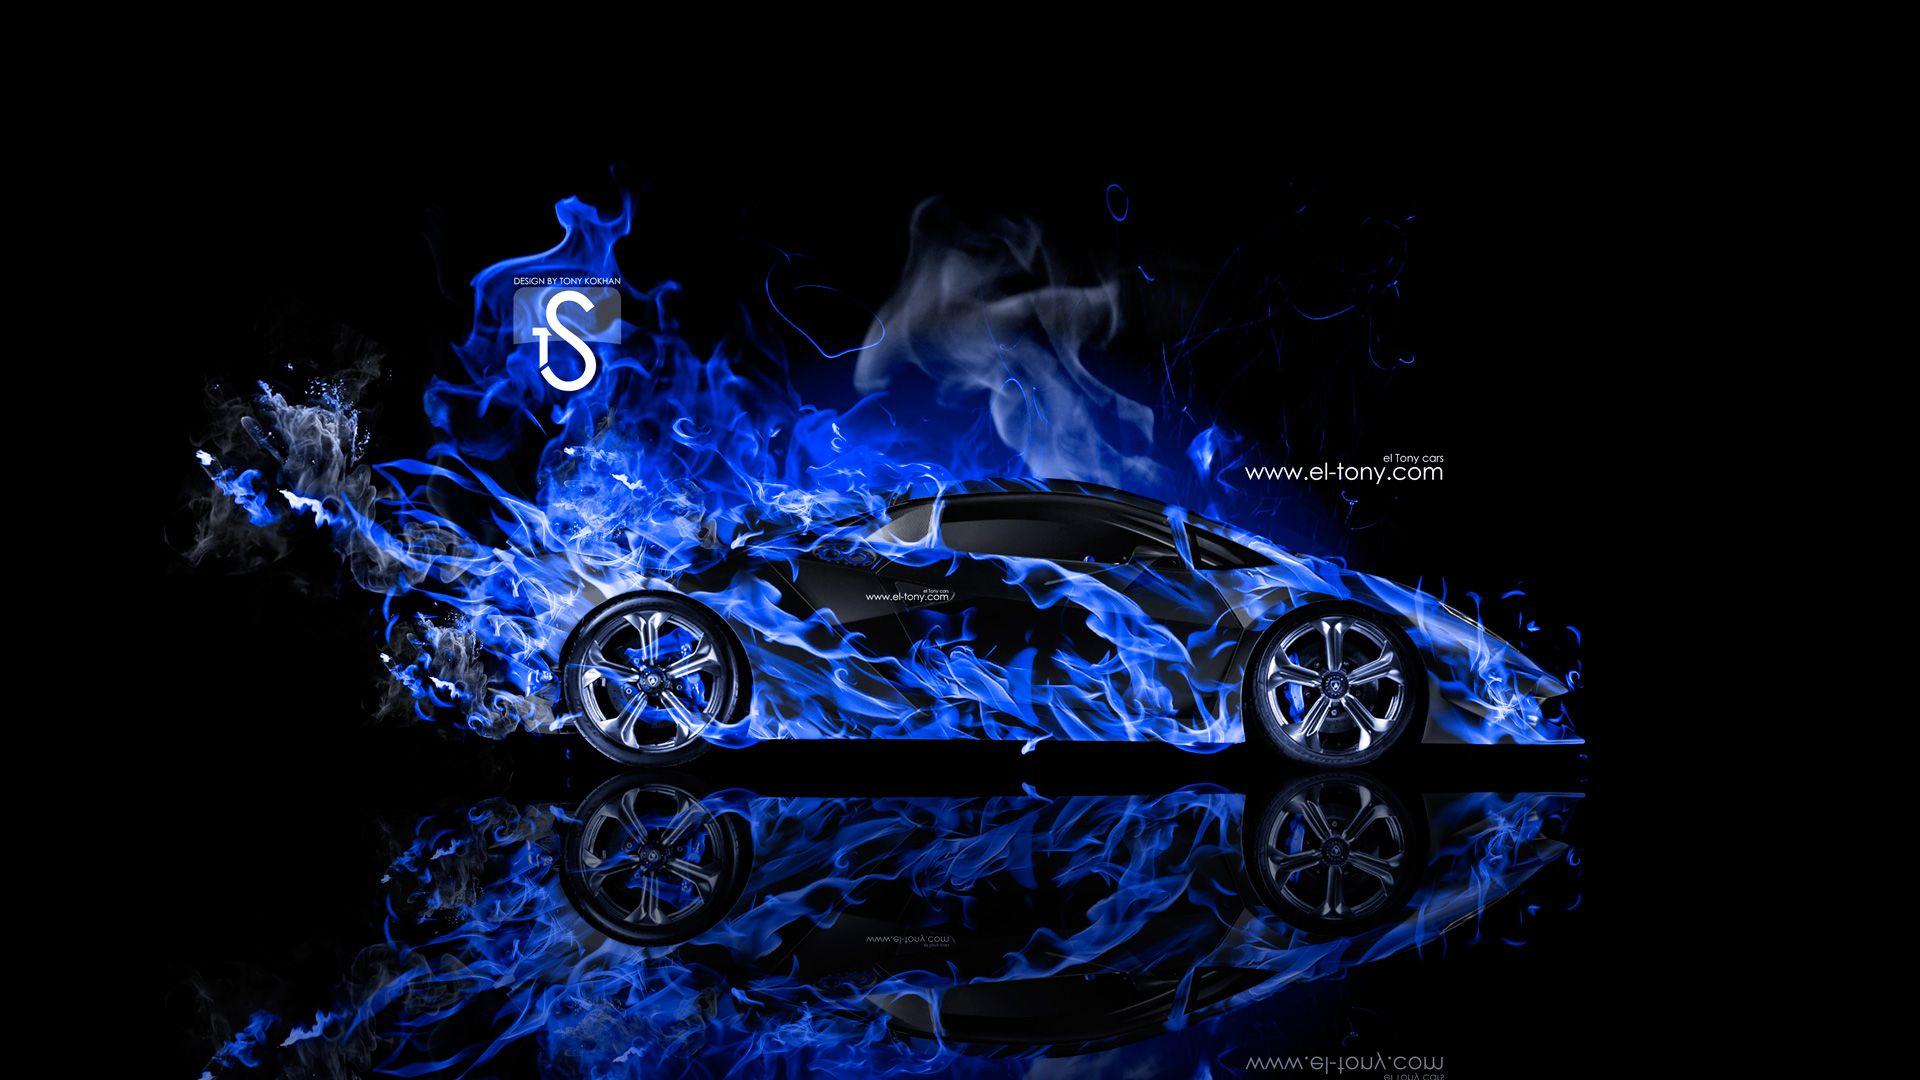 Black And Blue Lamborghini Wallpaper 1 Free Hd Wallpaper